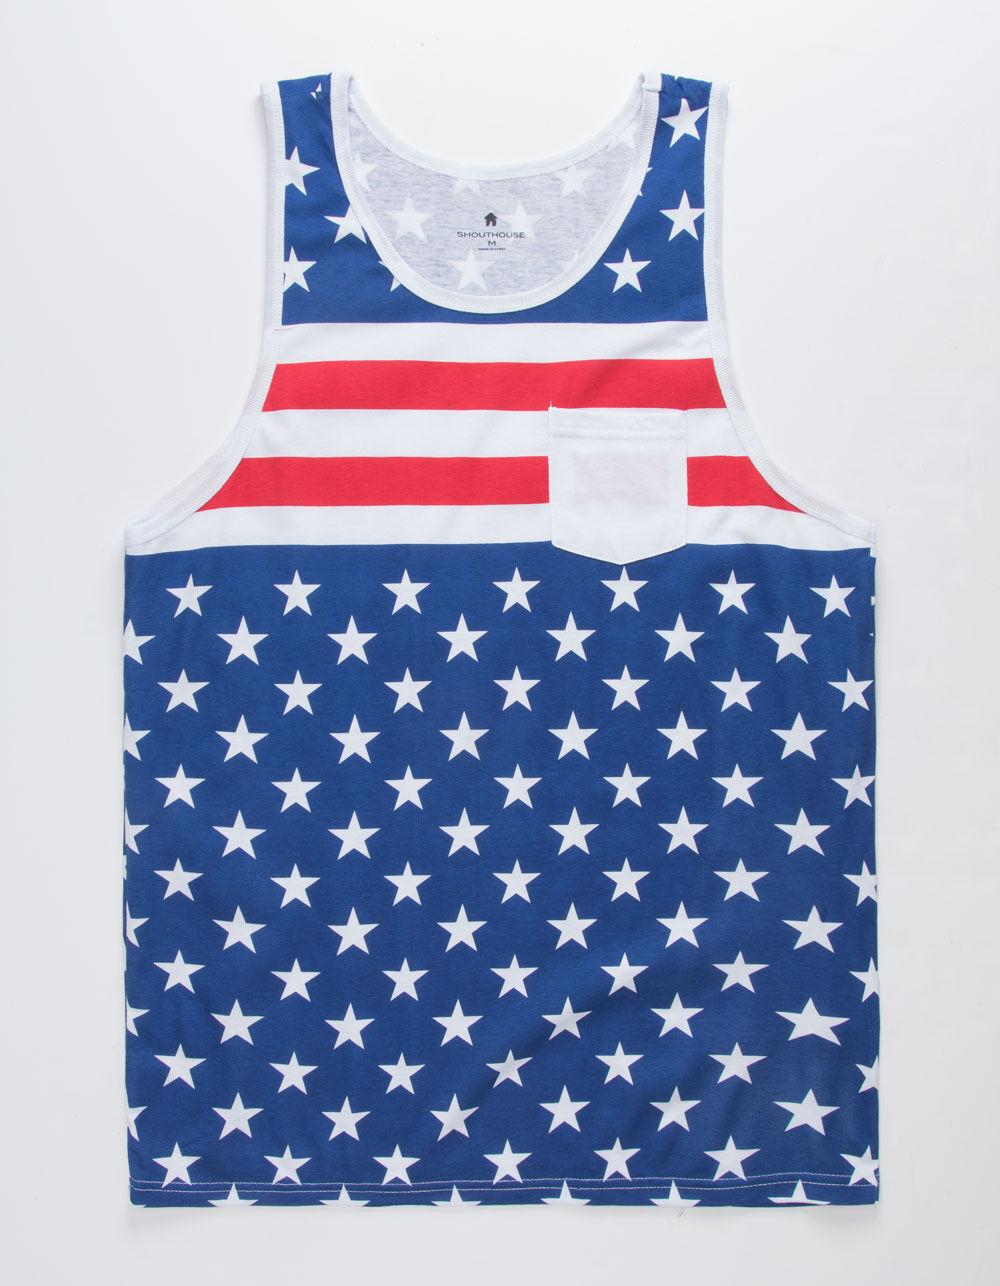 SHOUTHOUSE Americana Pocket Tank Top